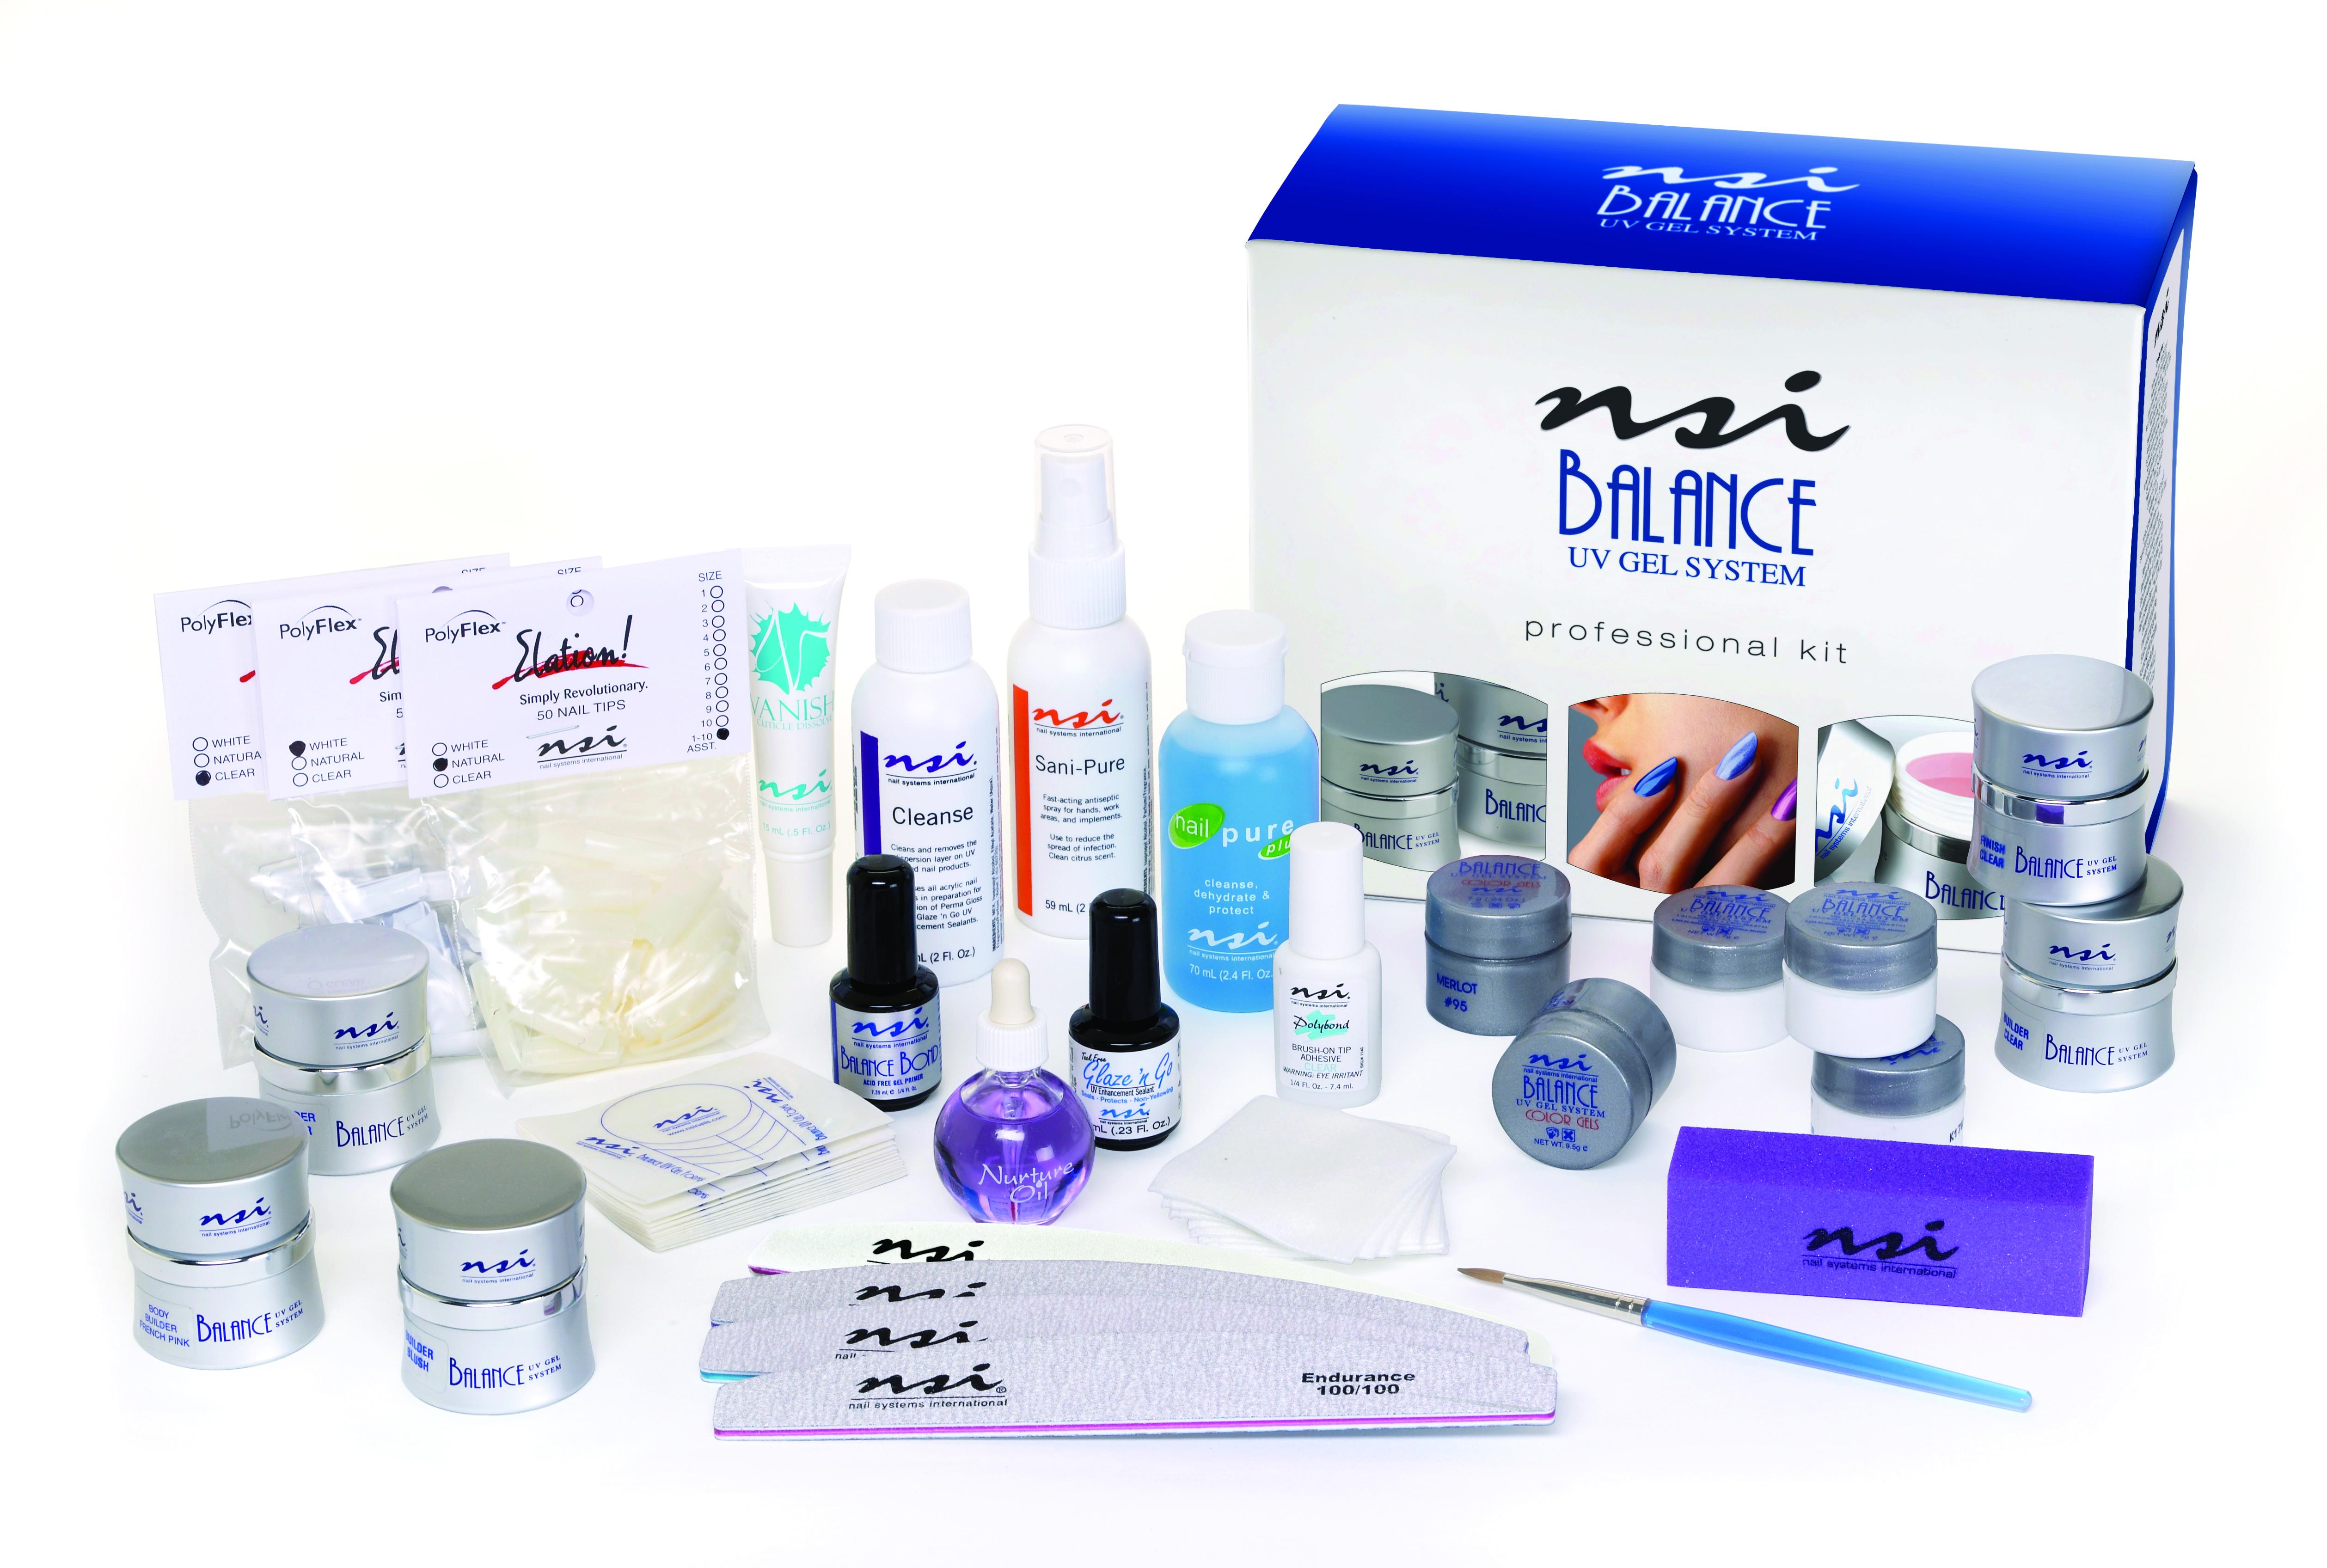 Balance UV Gel Professional Kit